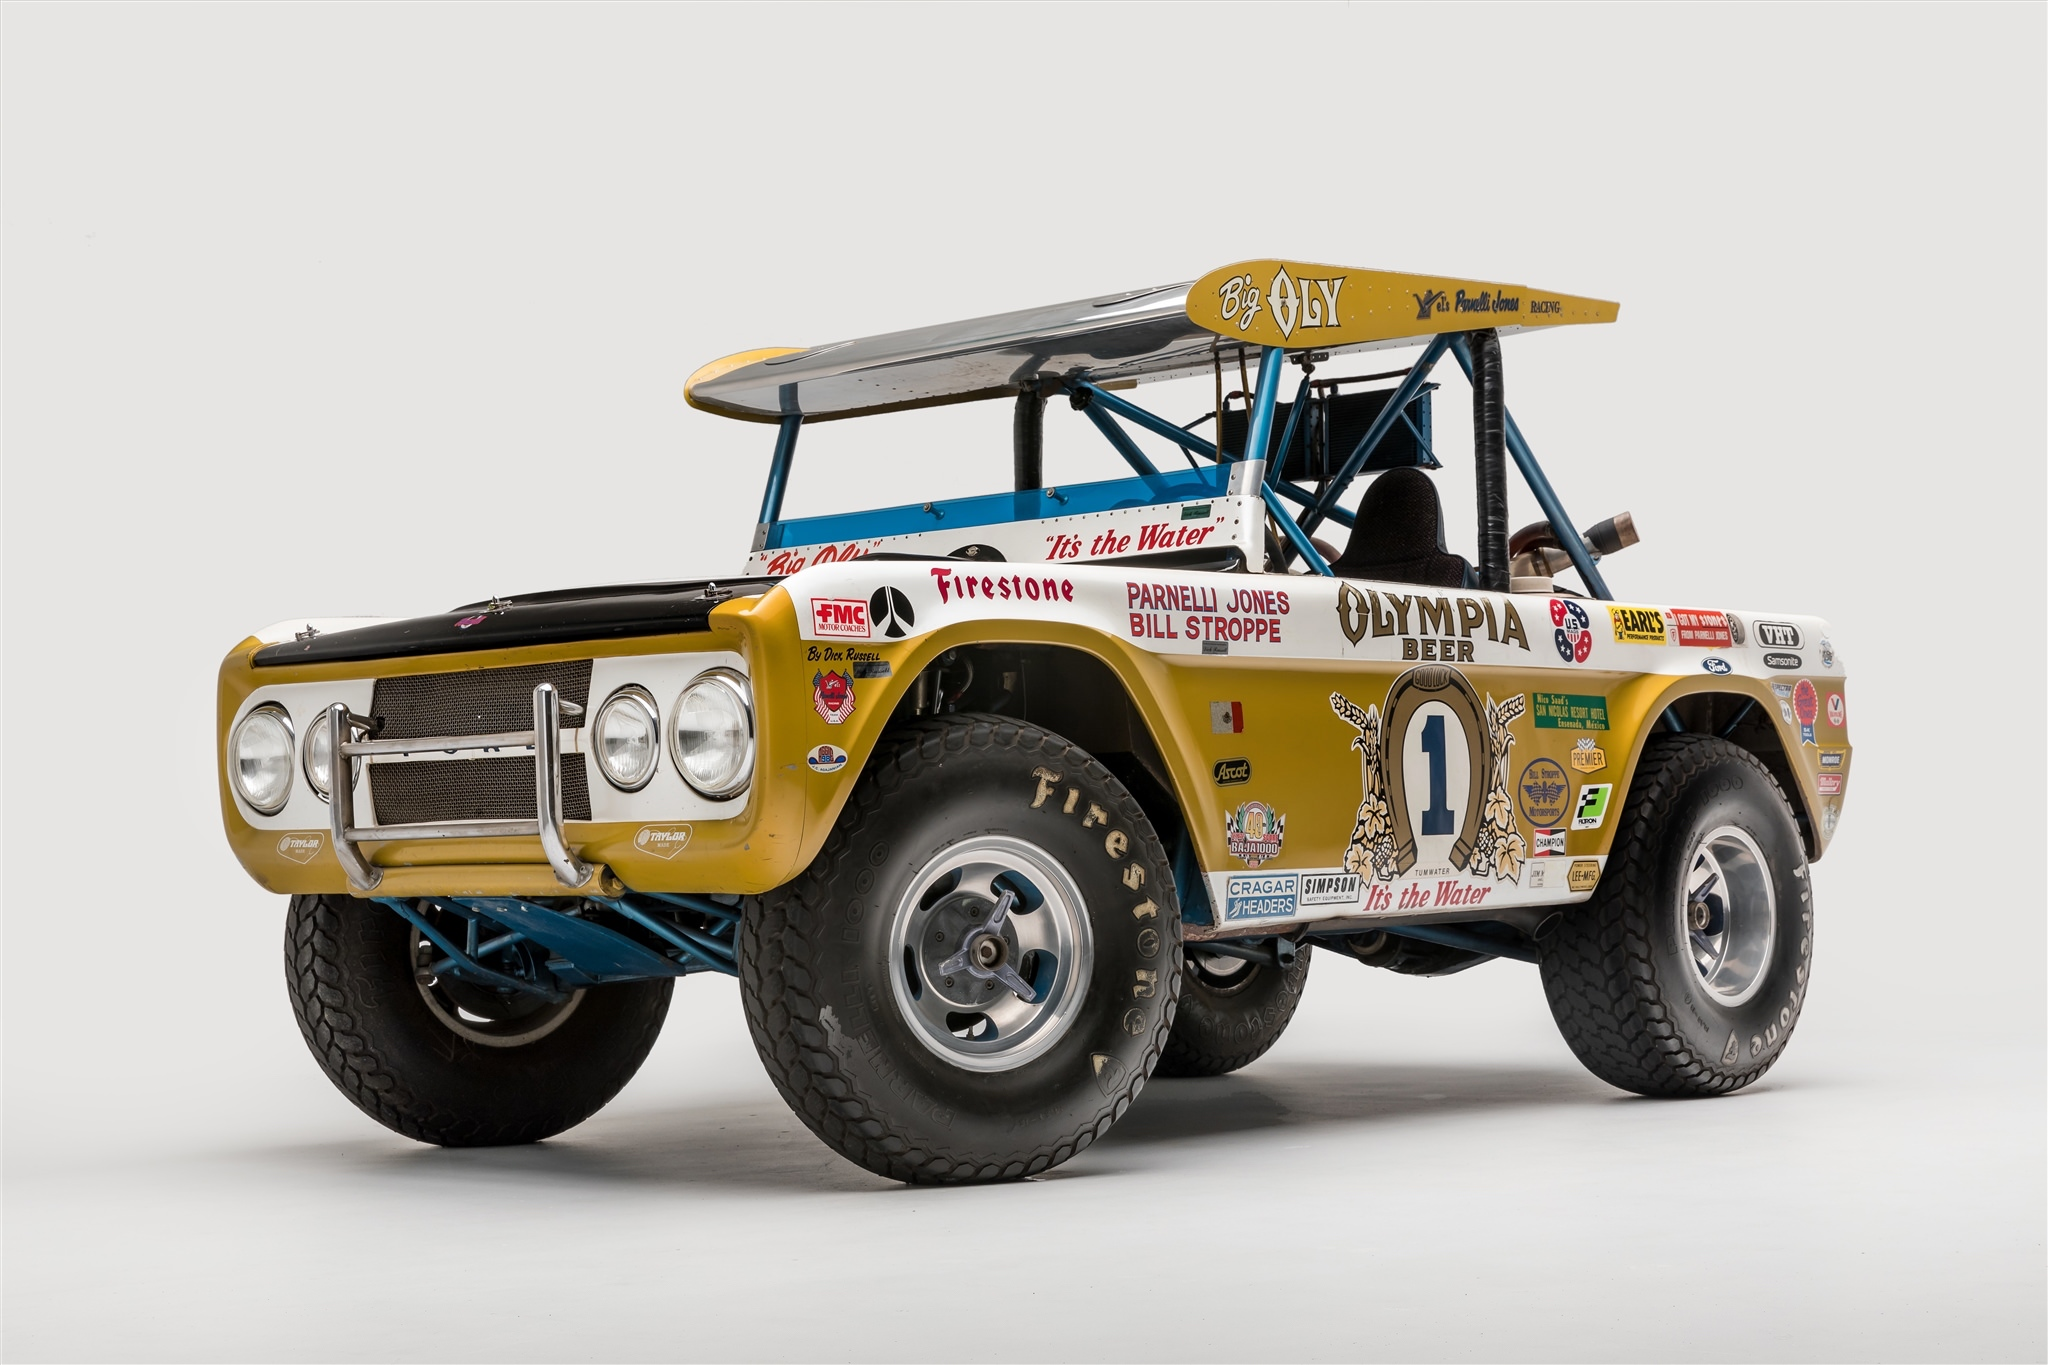 Big Oly Ford Bronco Hero